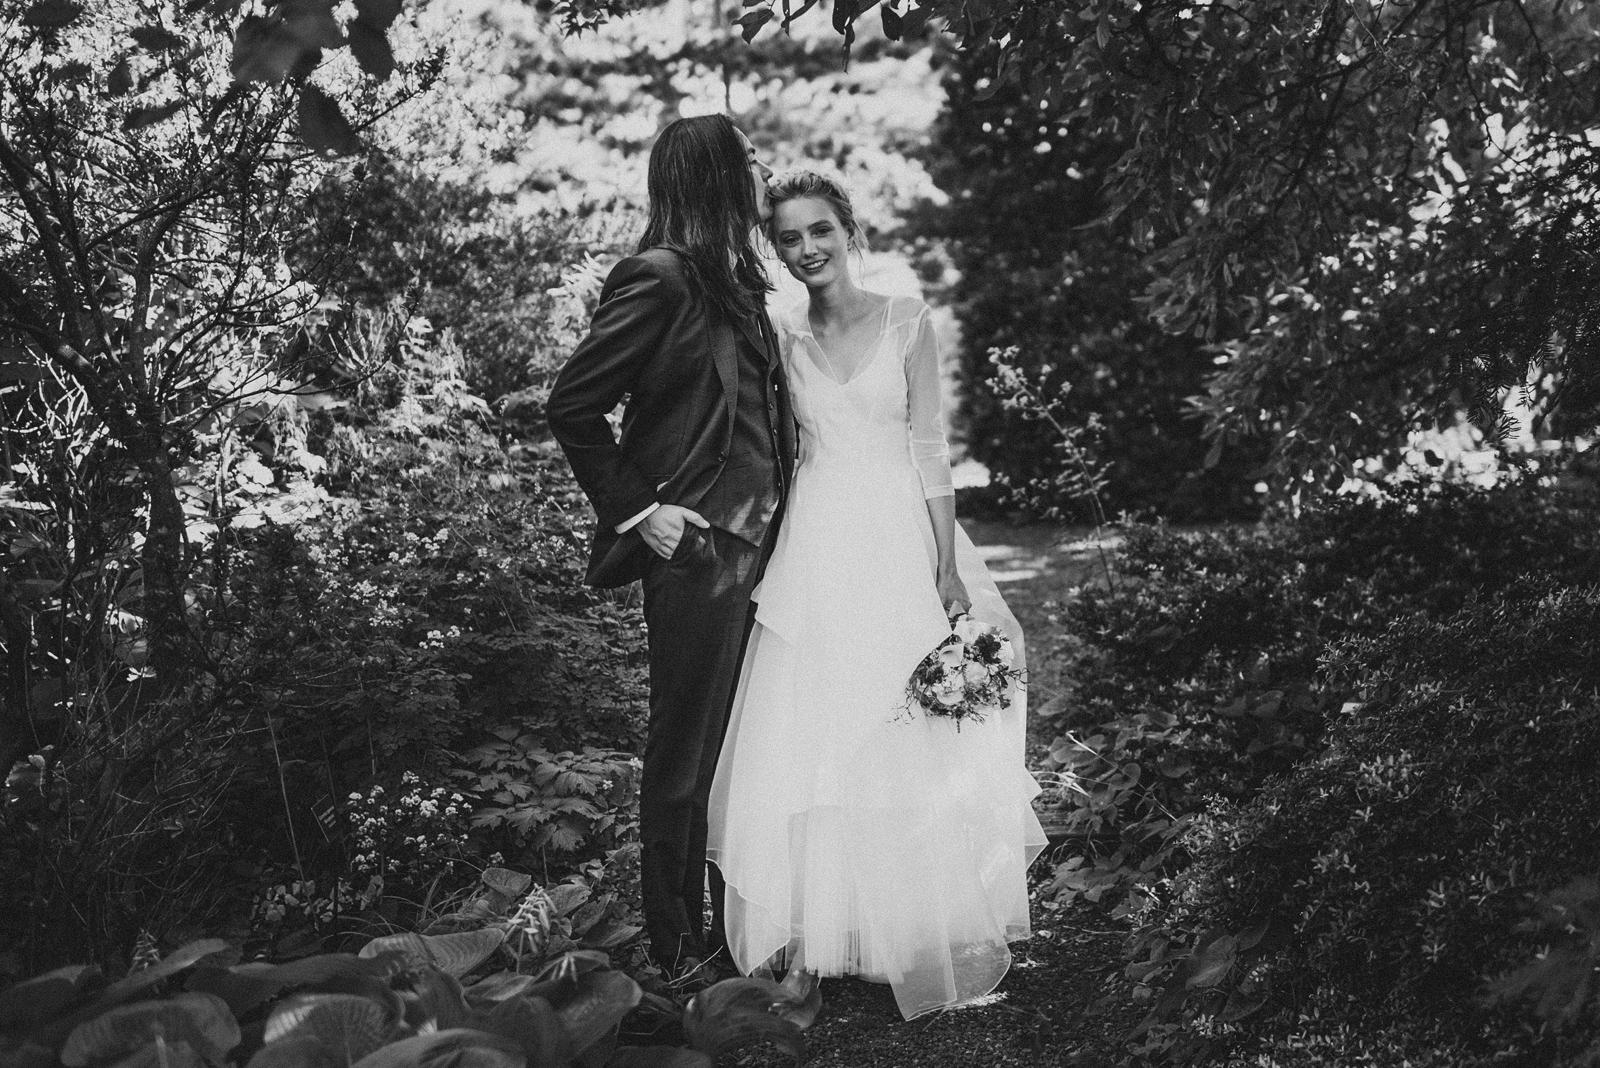 best_wedding_photographer_018.jpg